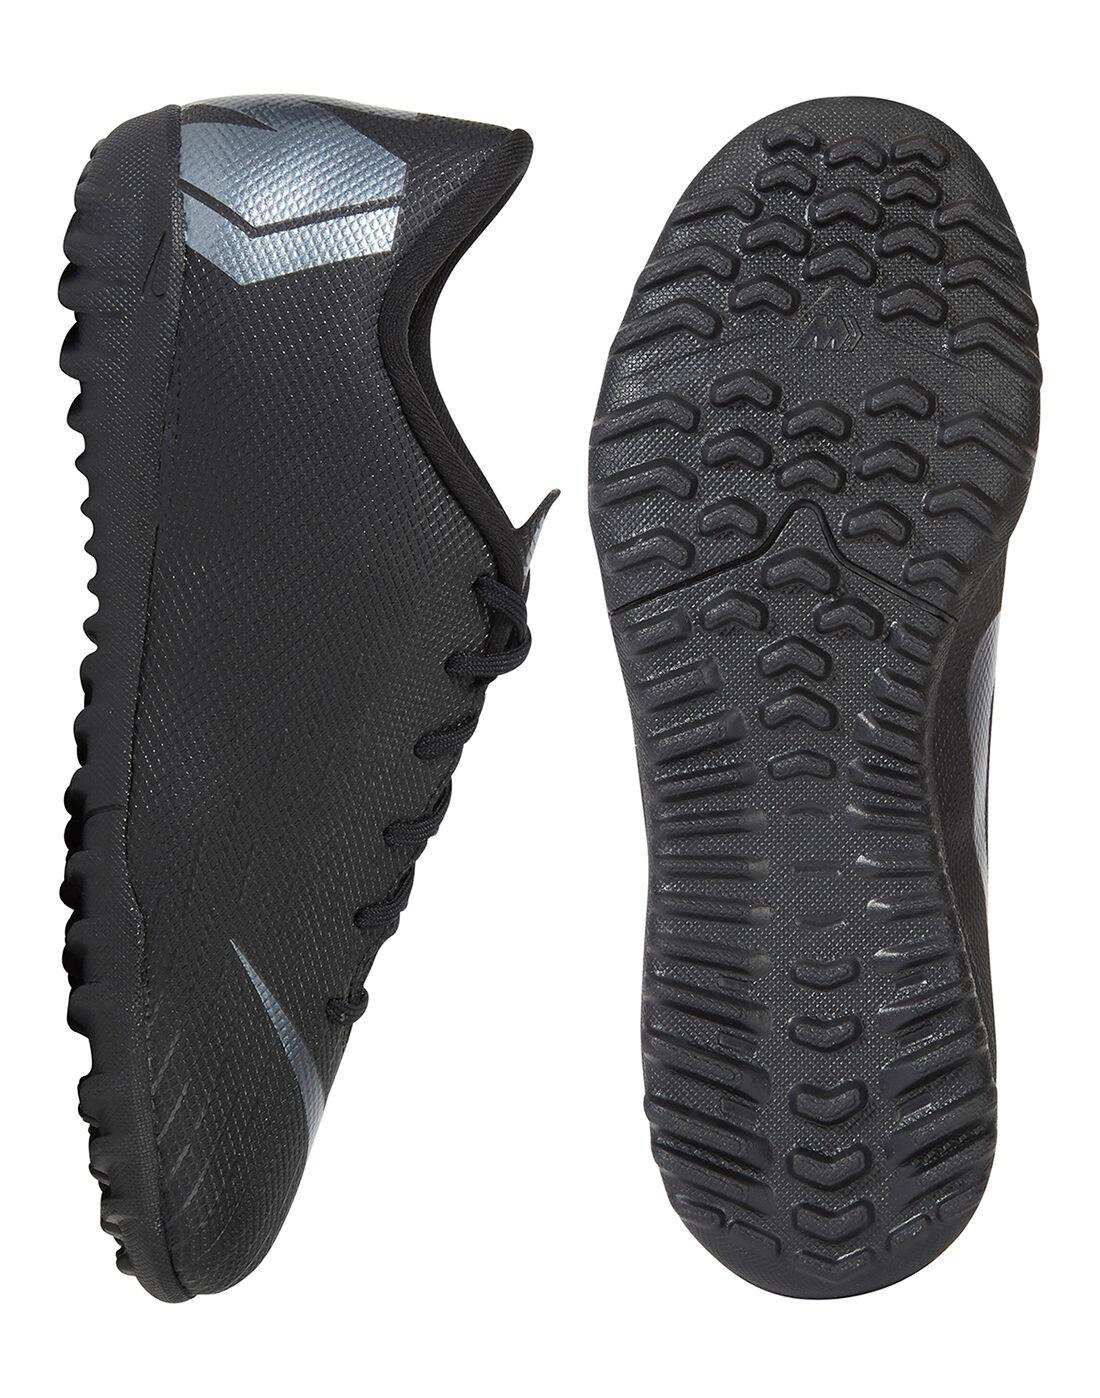 Kids Nike Mercurial Astro Turf Boots